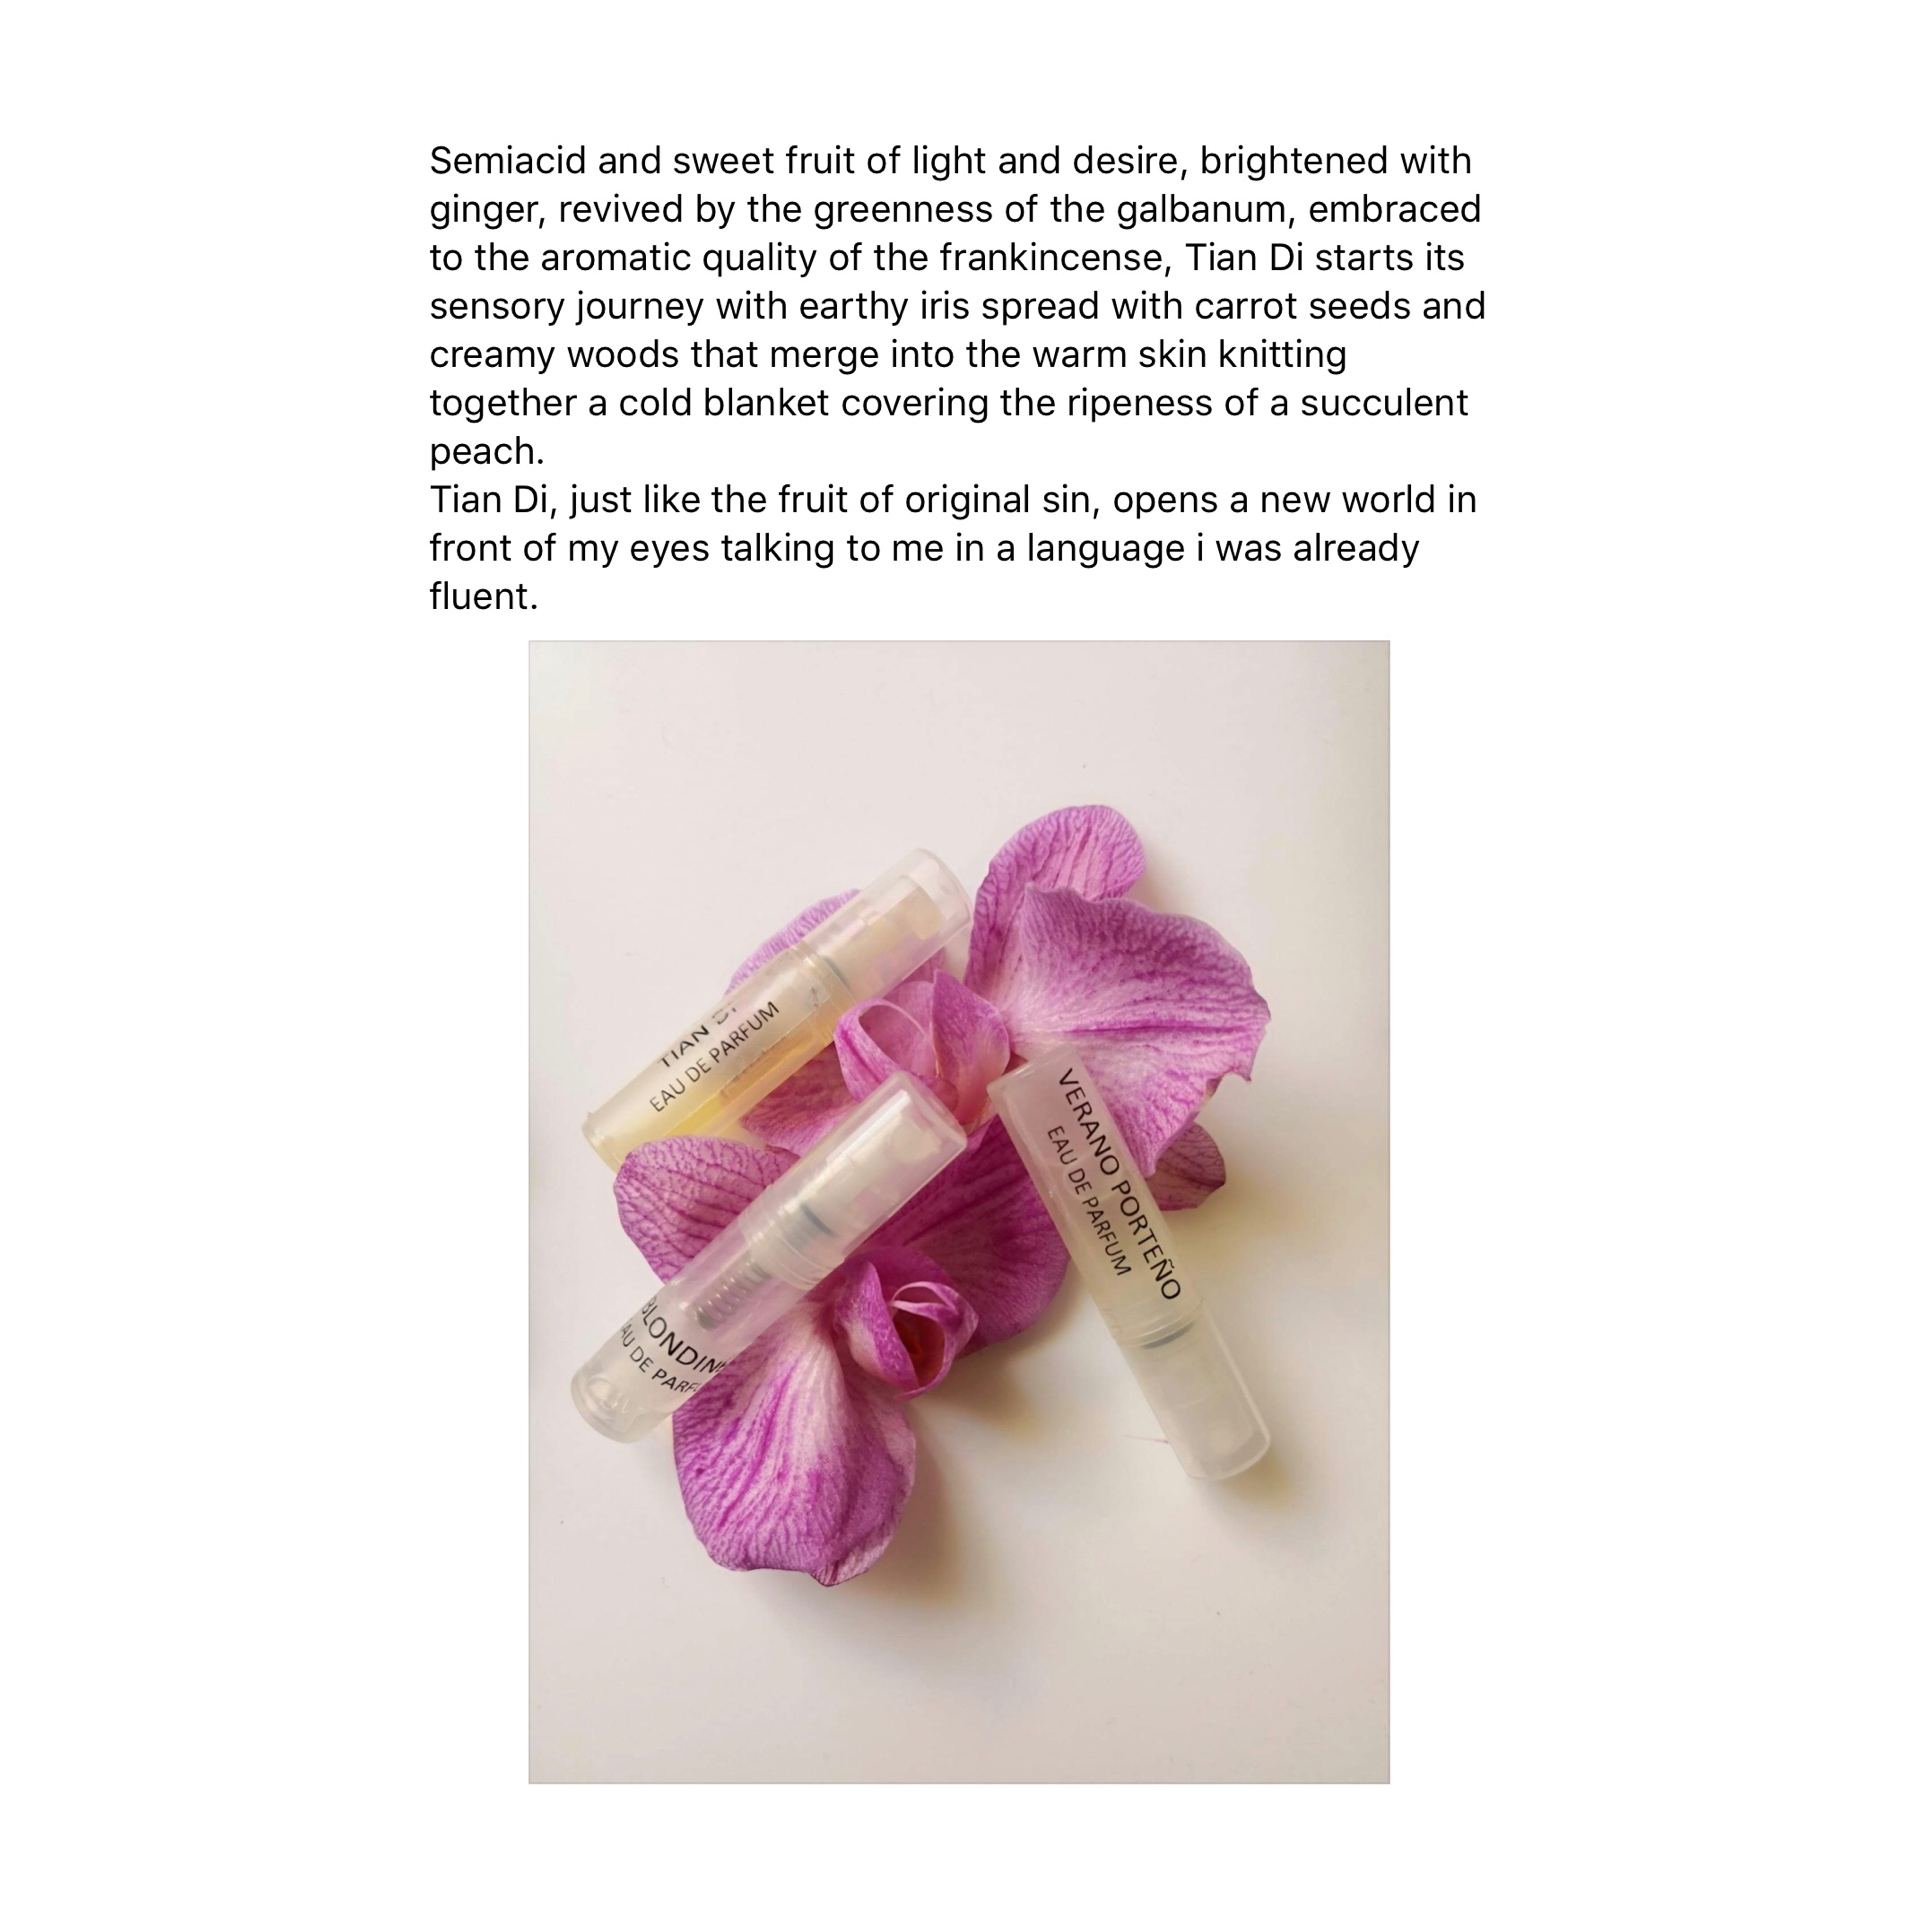 Fragrance Review Anayelperfume Tian Di by FRASSAI